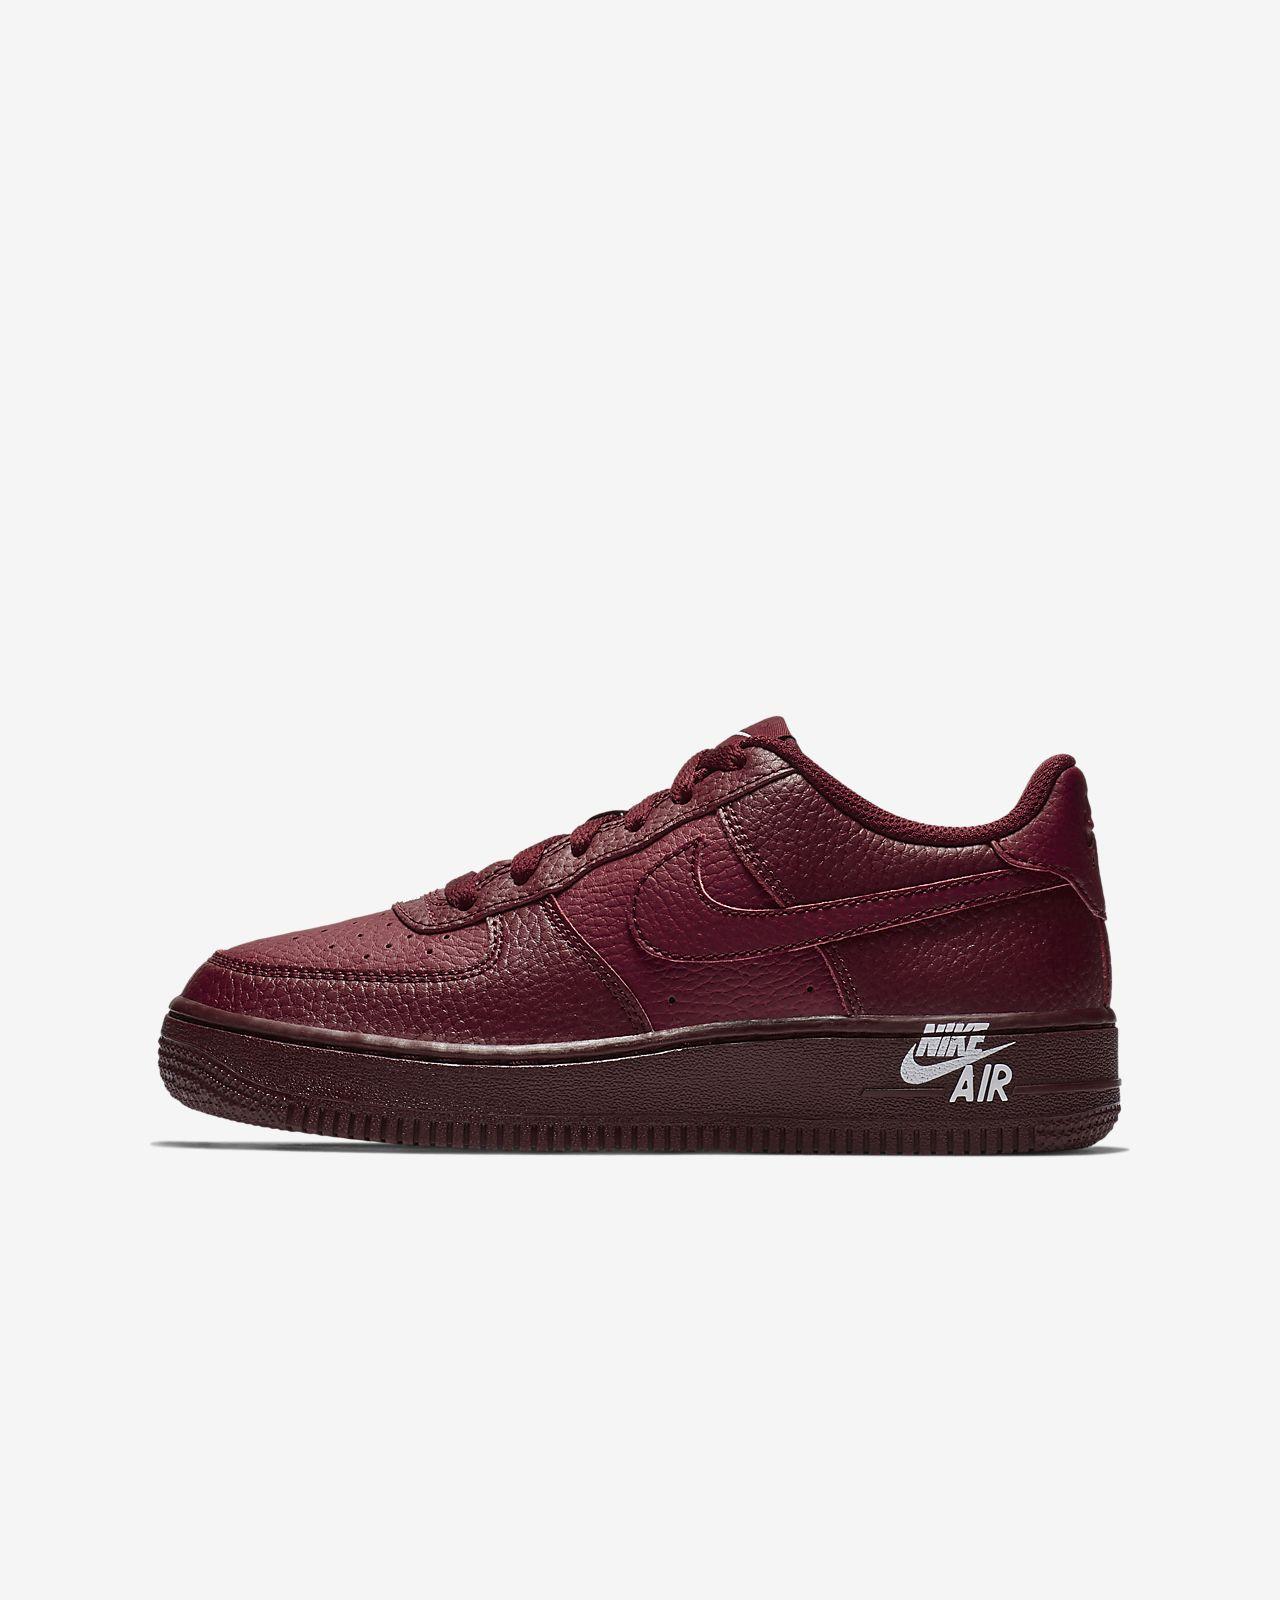 separation shoes c88e2 4ad48 ... order nike air force 1 sko til store barn 046b4 47018